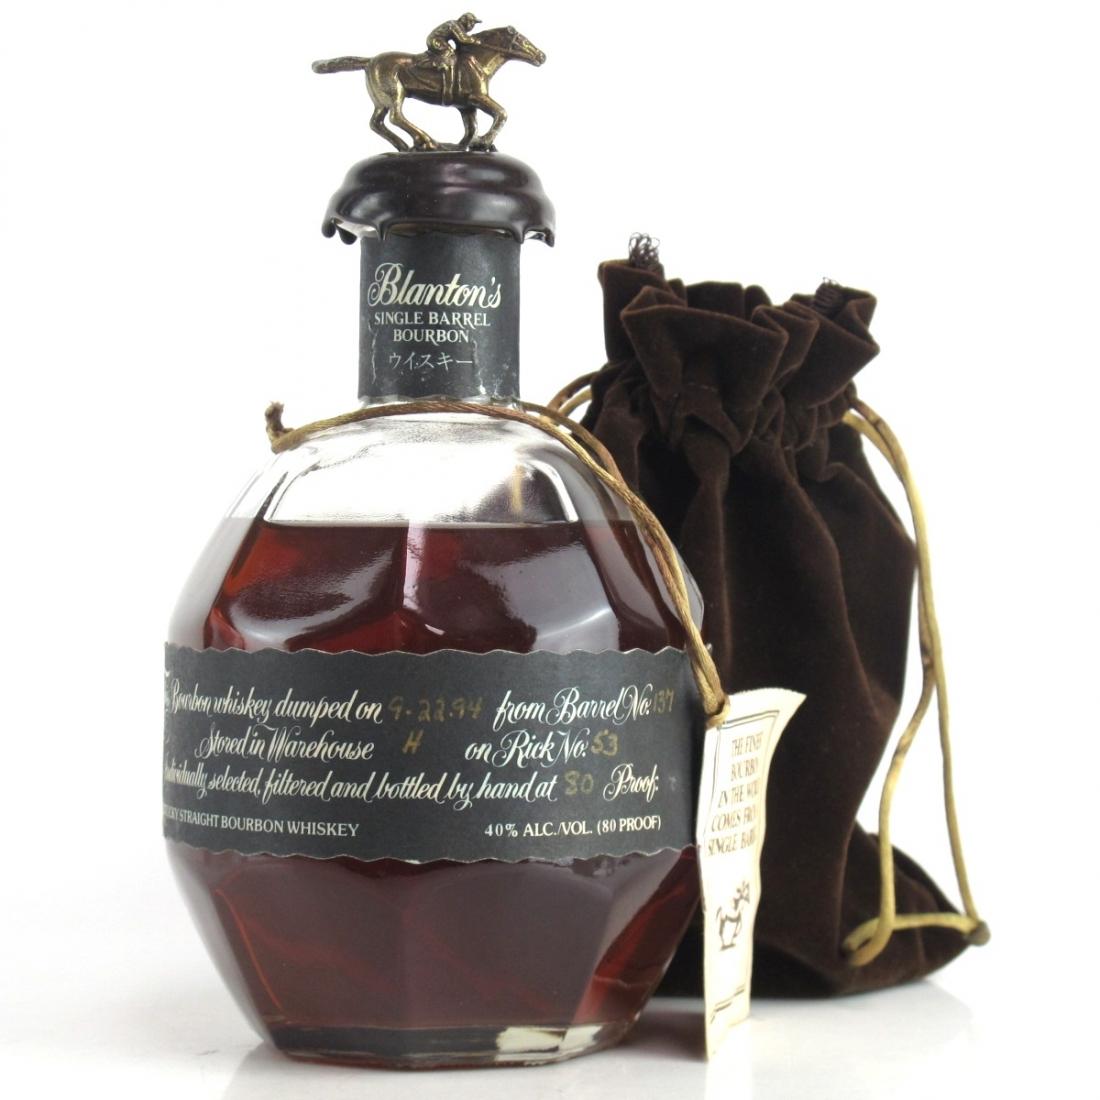 Blanton's Single Barrel Bourbon Dumped 1994 / Japanese Import